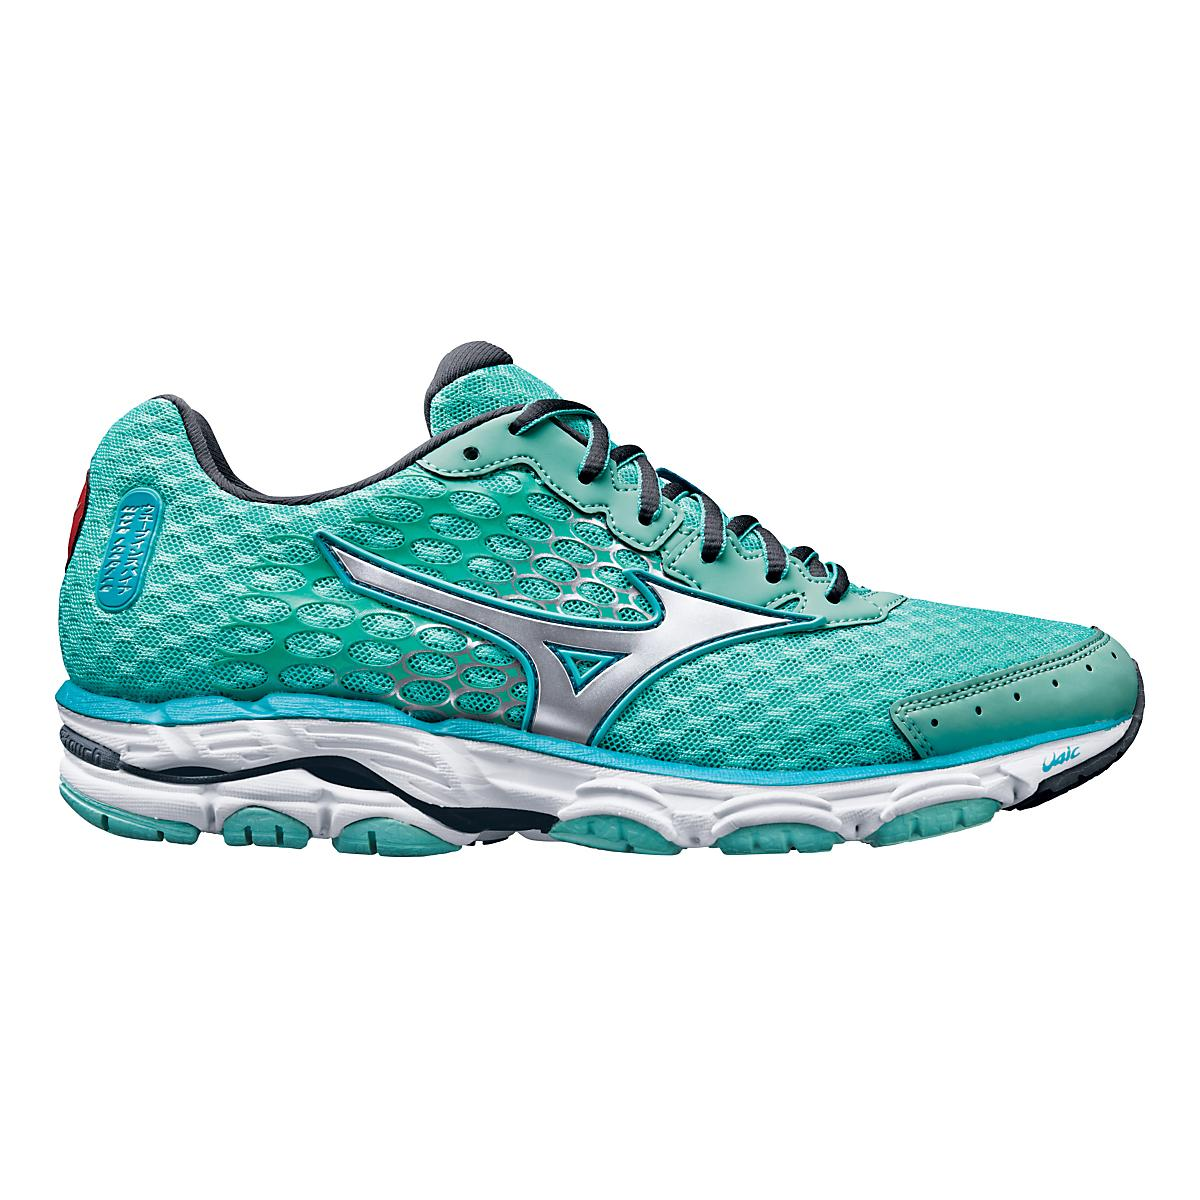 28f9945d859d Womens Mizuno Wave Inspire 11 Running Shoe at Road Runner Sports